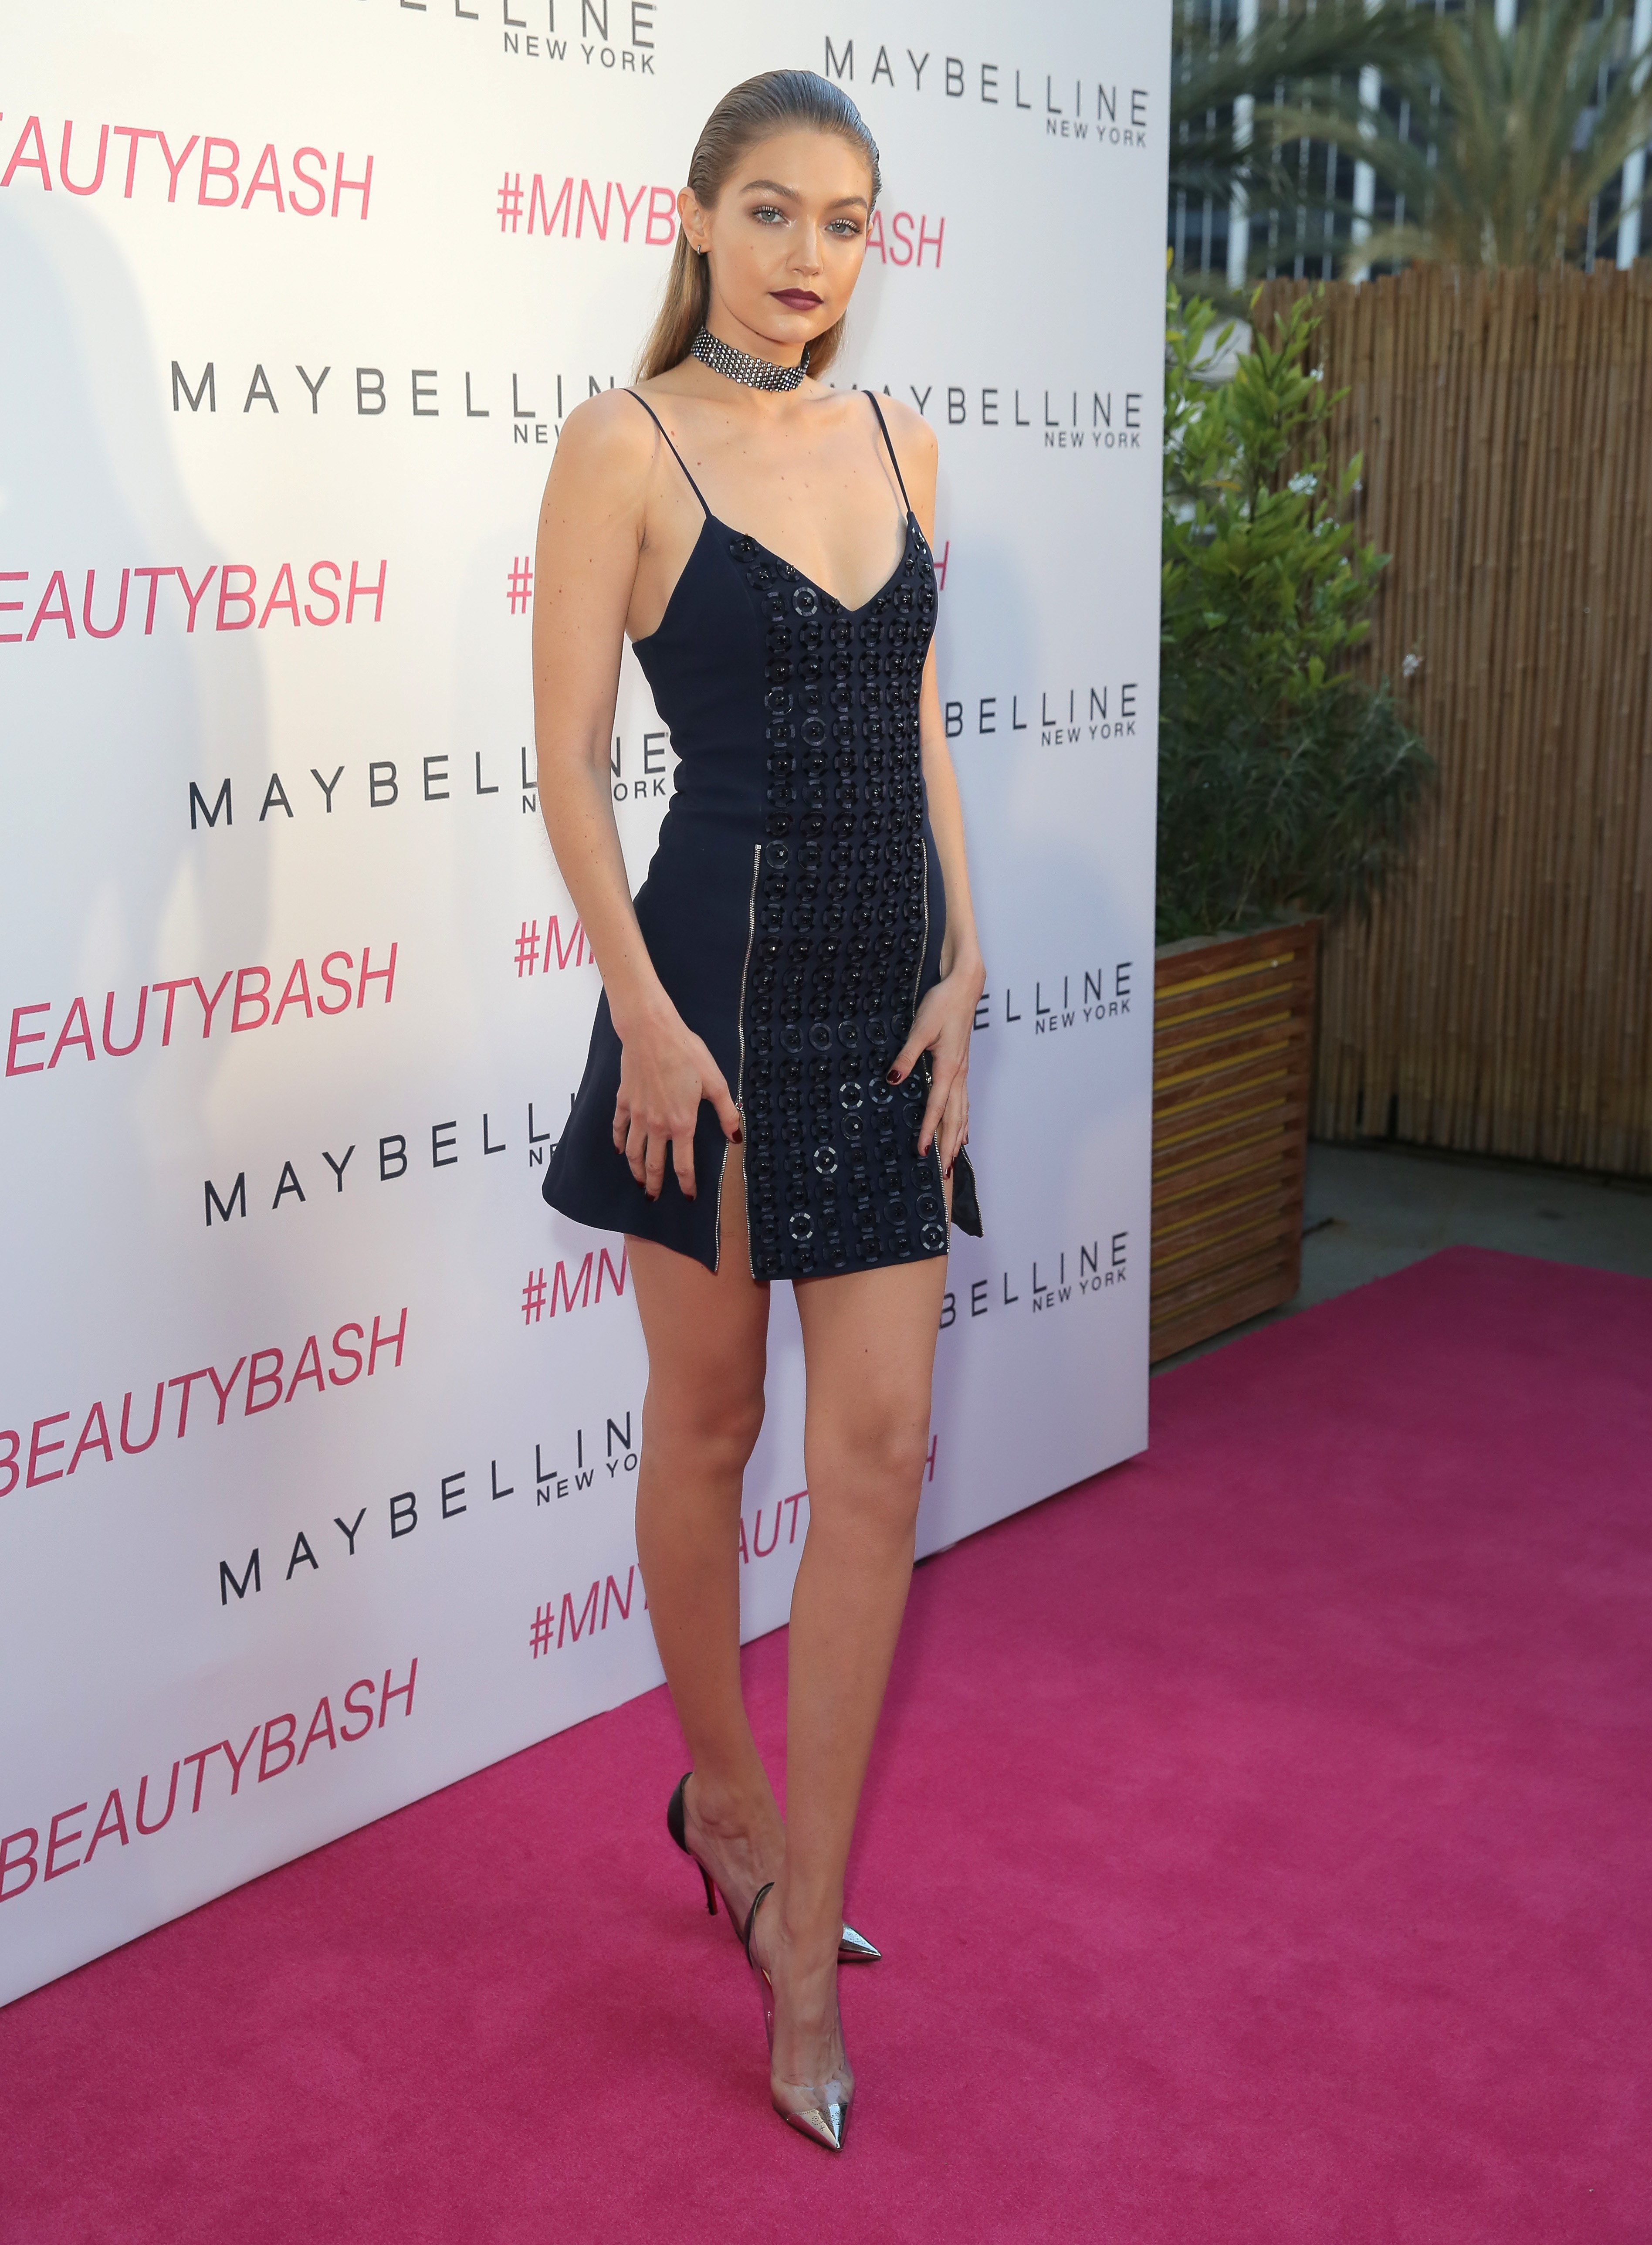 Gigi Hadid on model wars: The industry needed a change